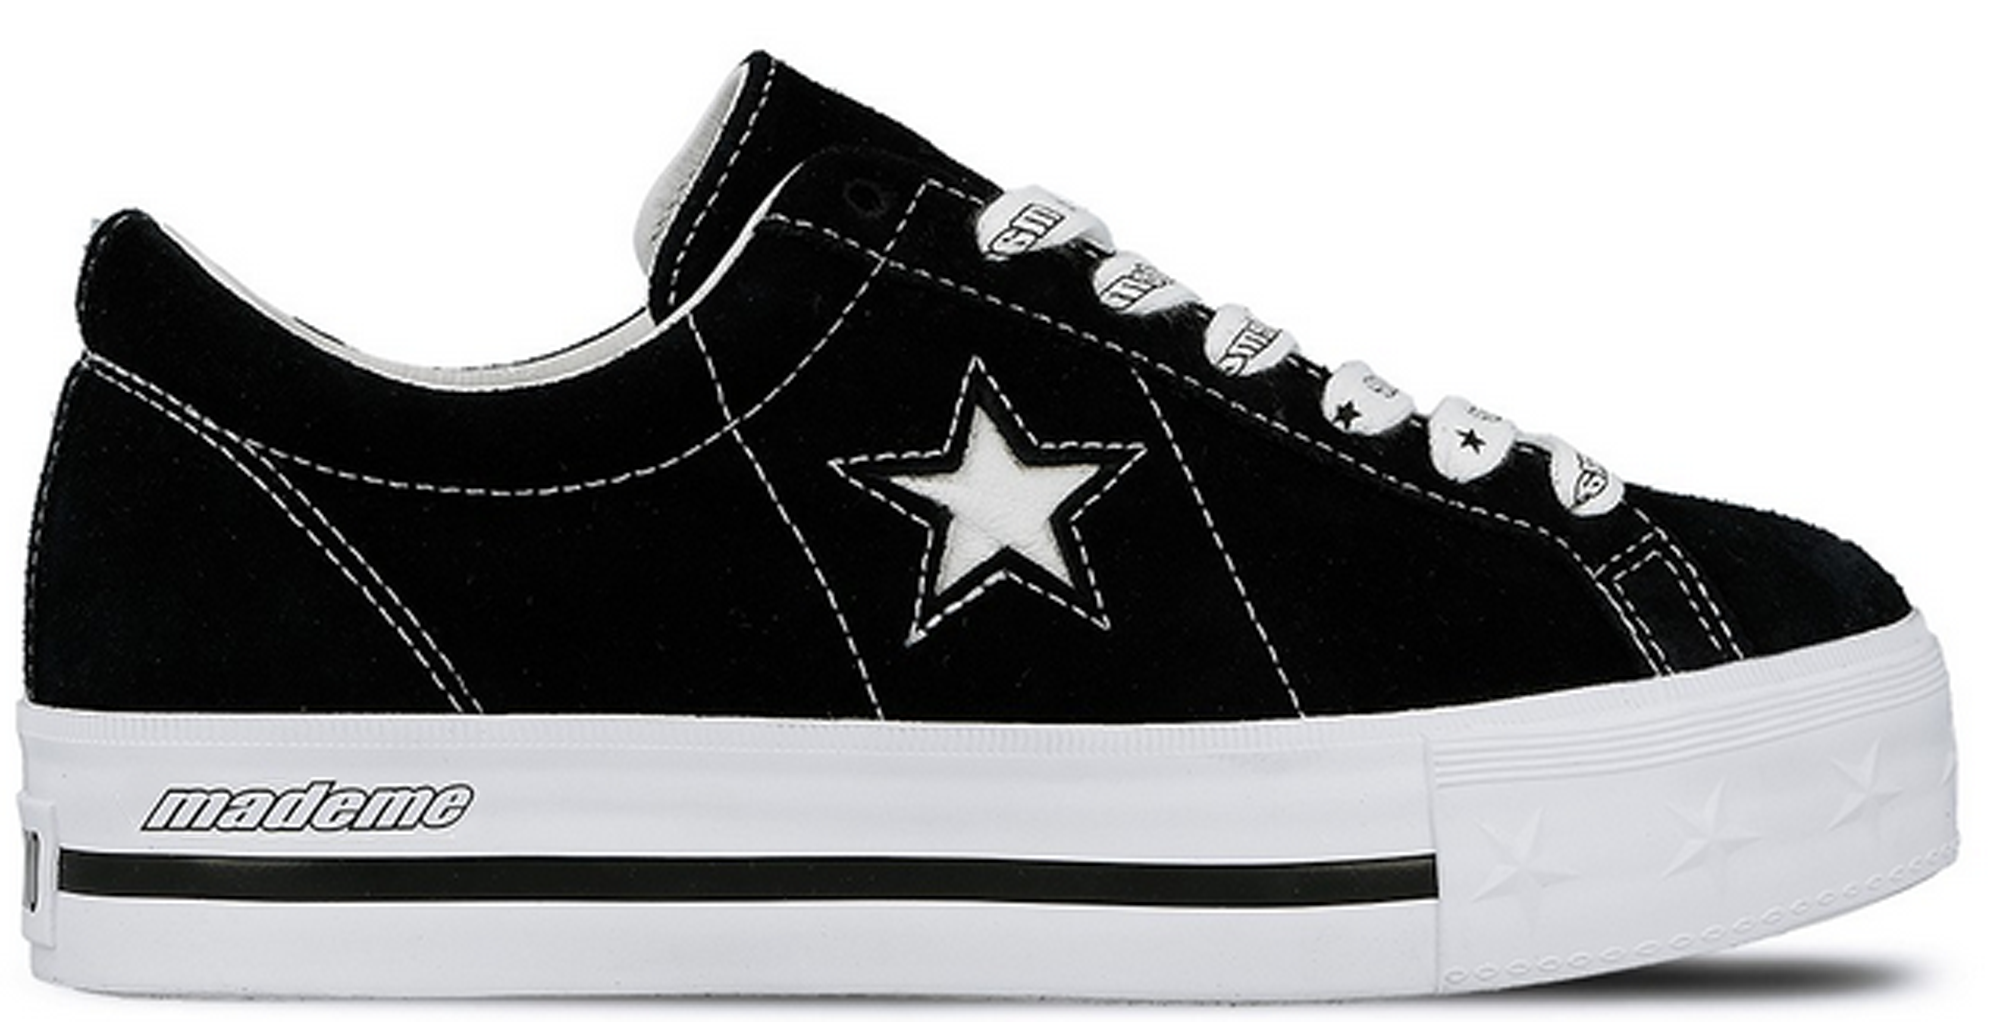 Converse One Star Platform Ox MadeMe Black (W)